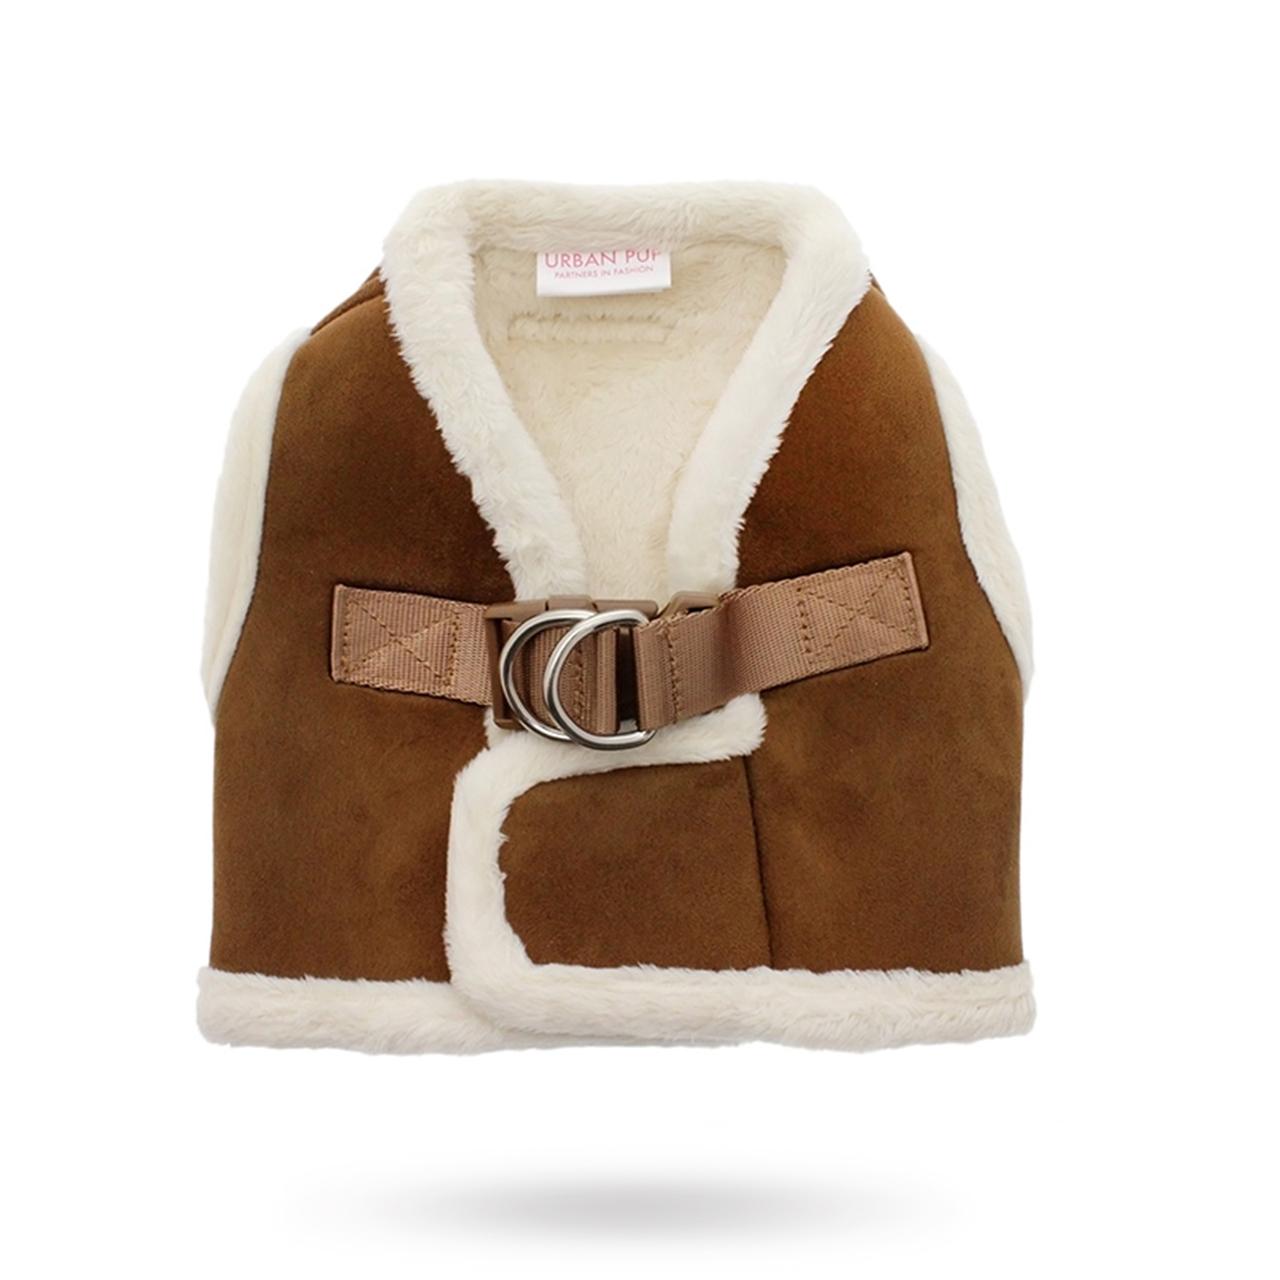 Luxury Brown & Cream Faux Shearling Hundsele